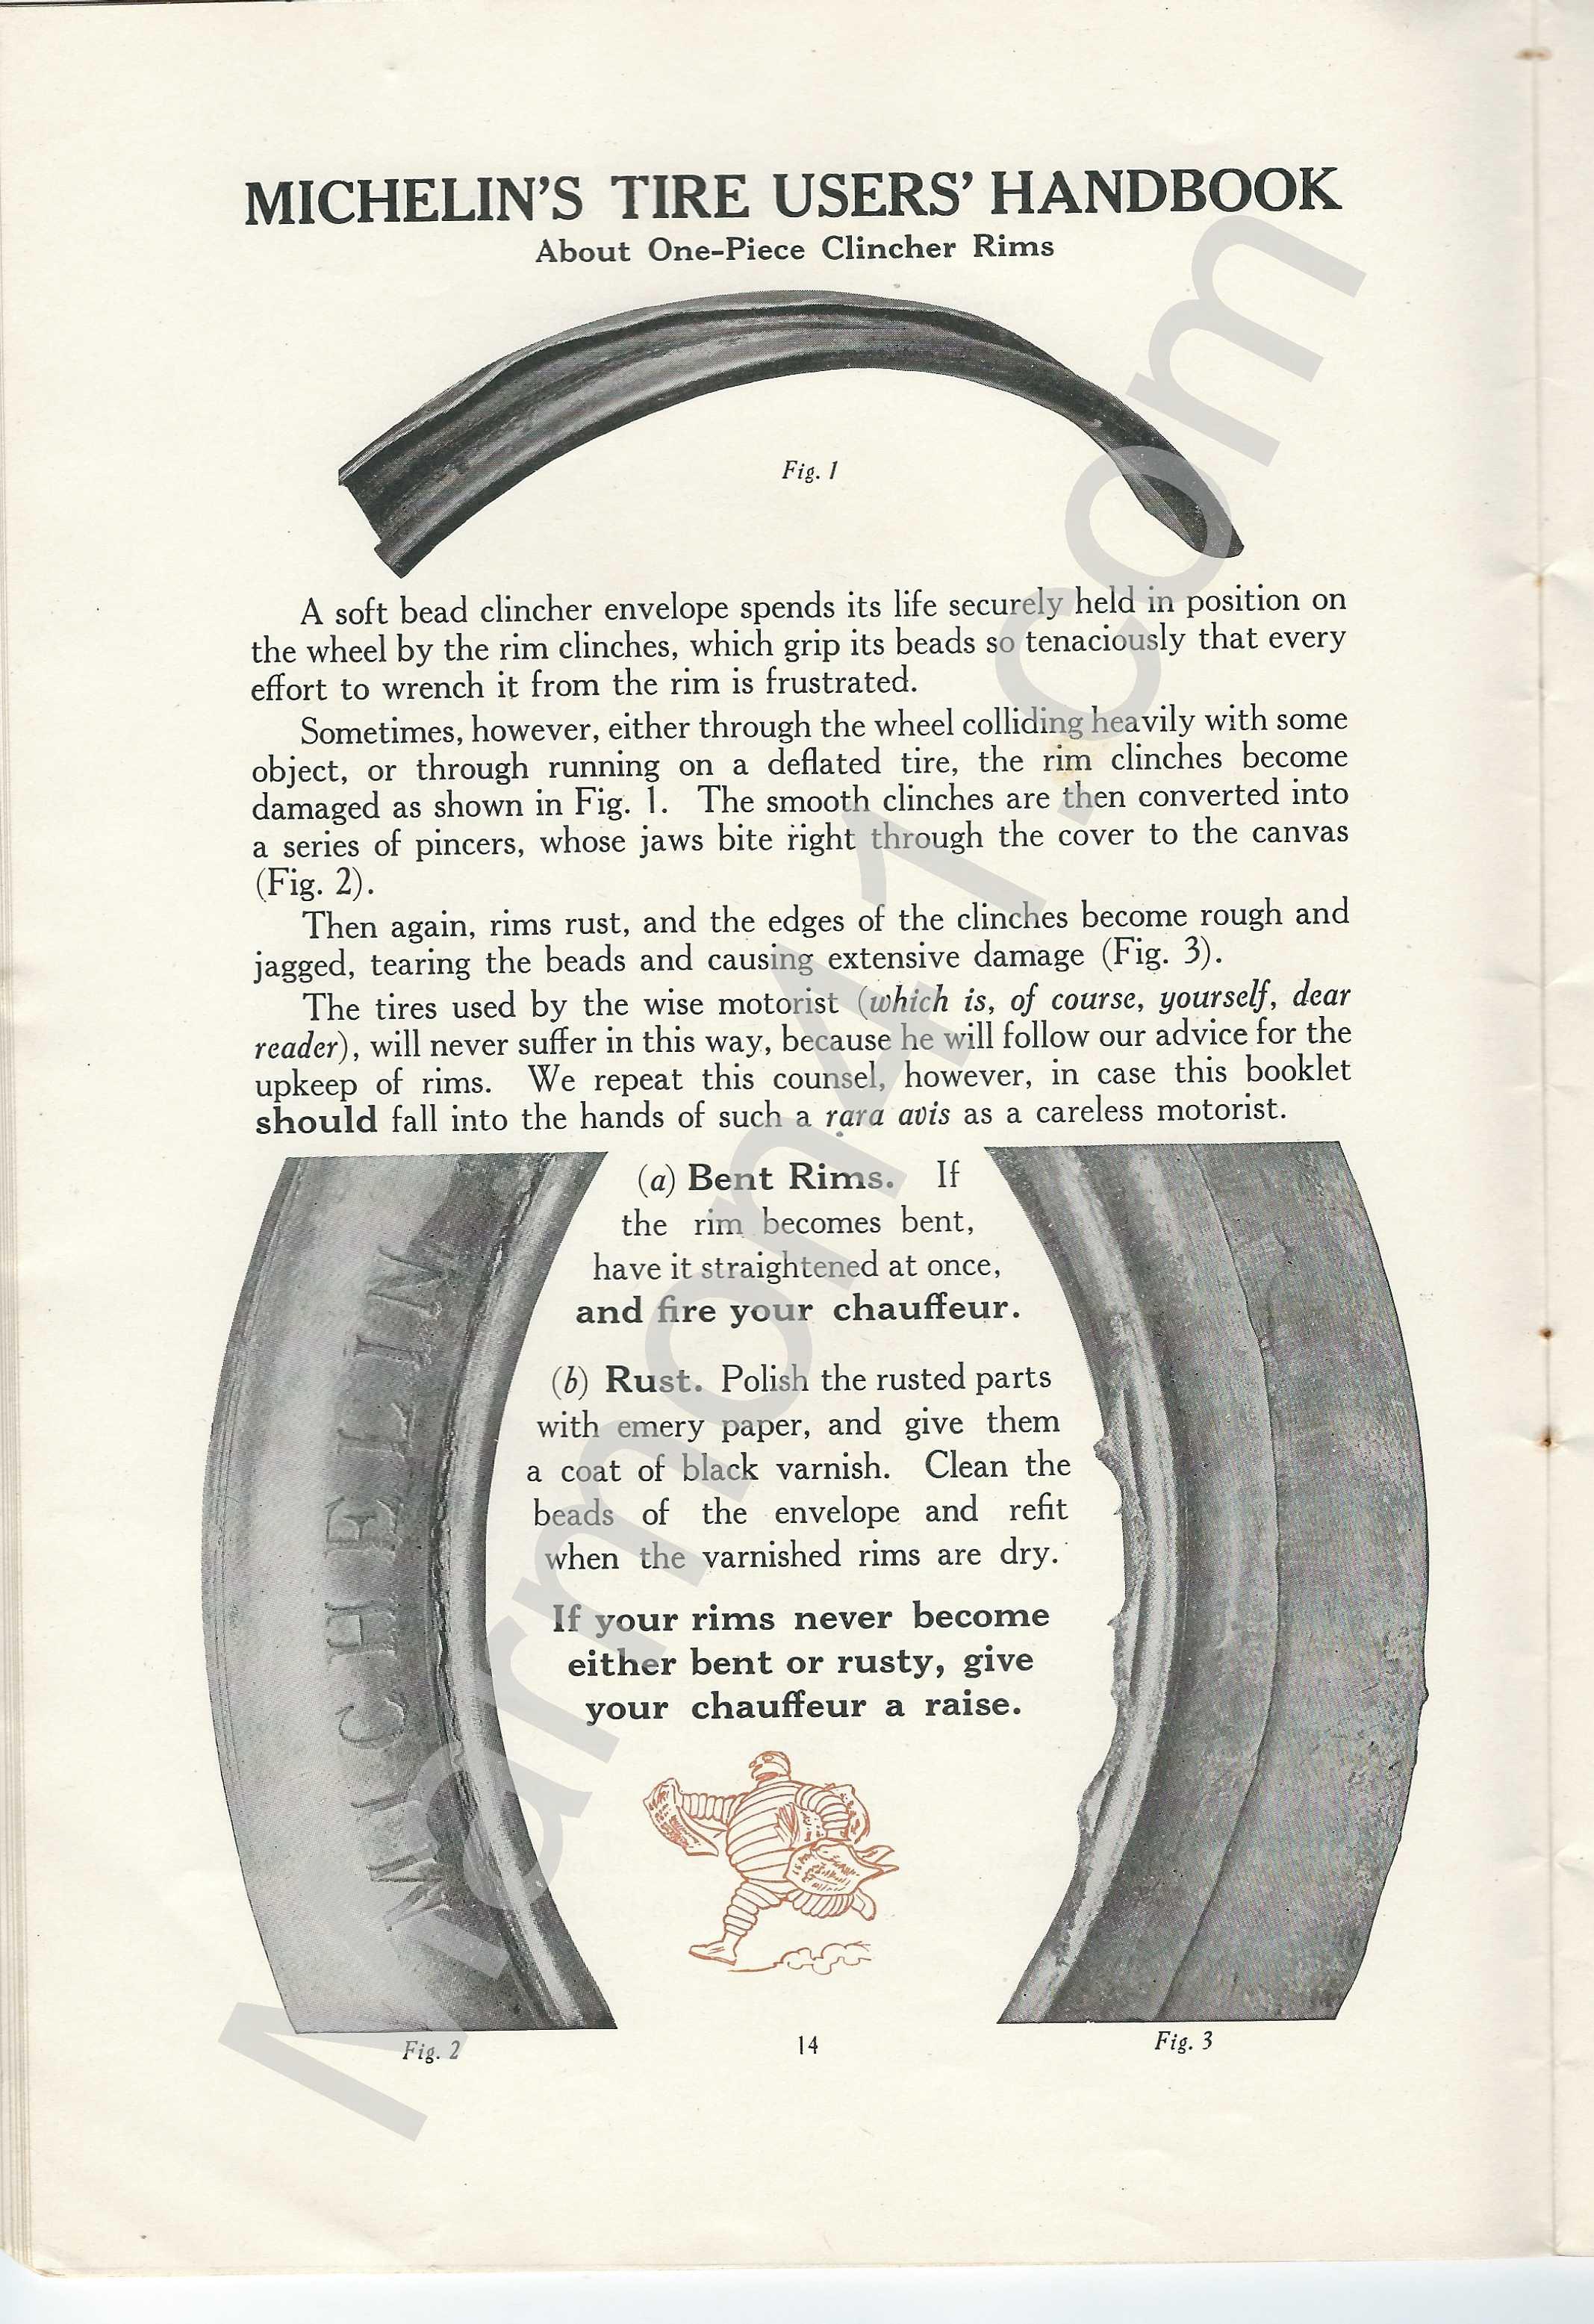 Michelins Tire Users Handbook_15